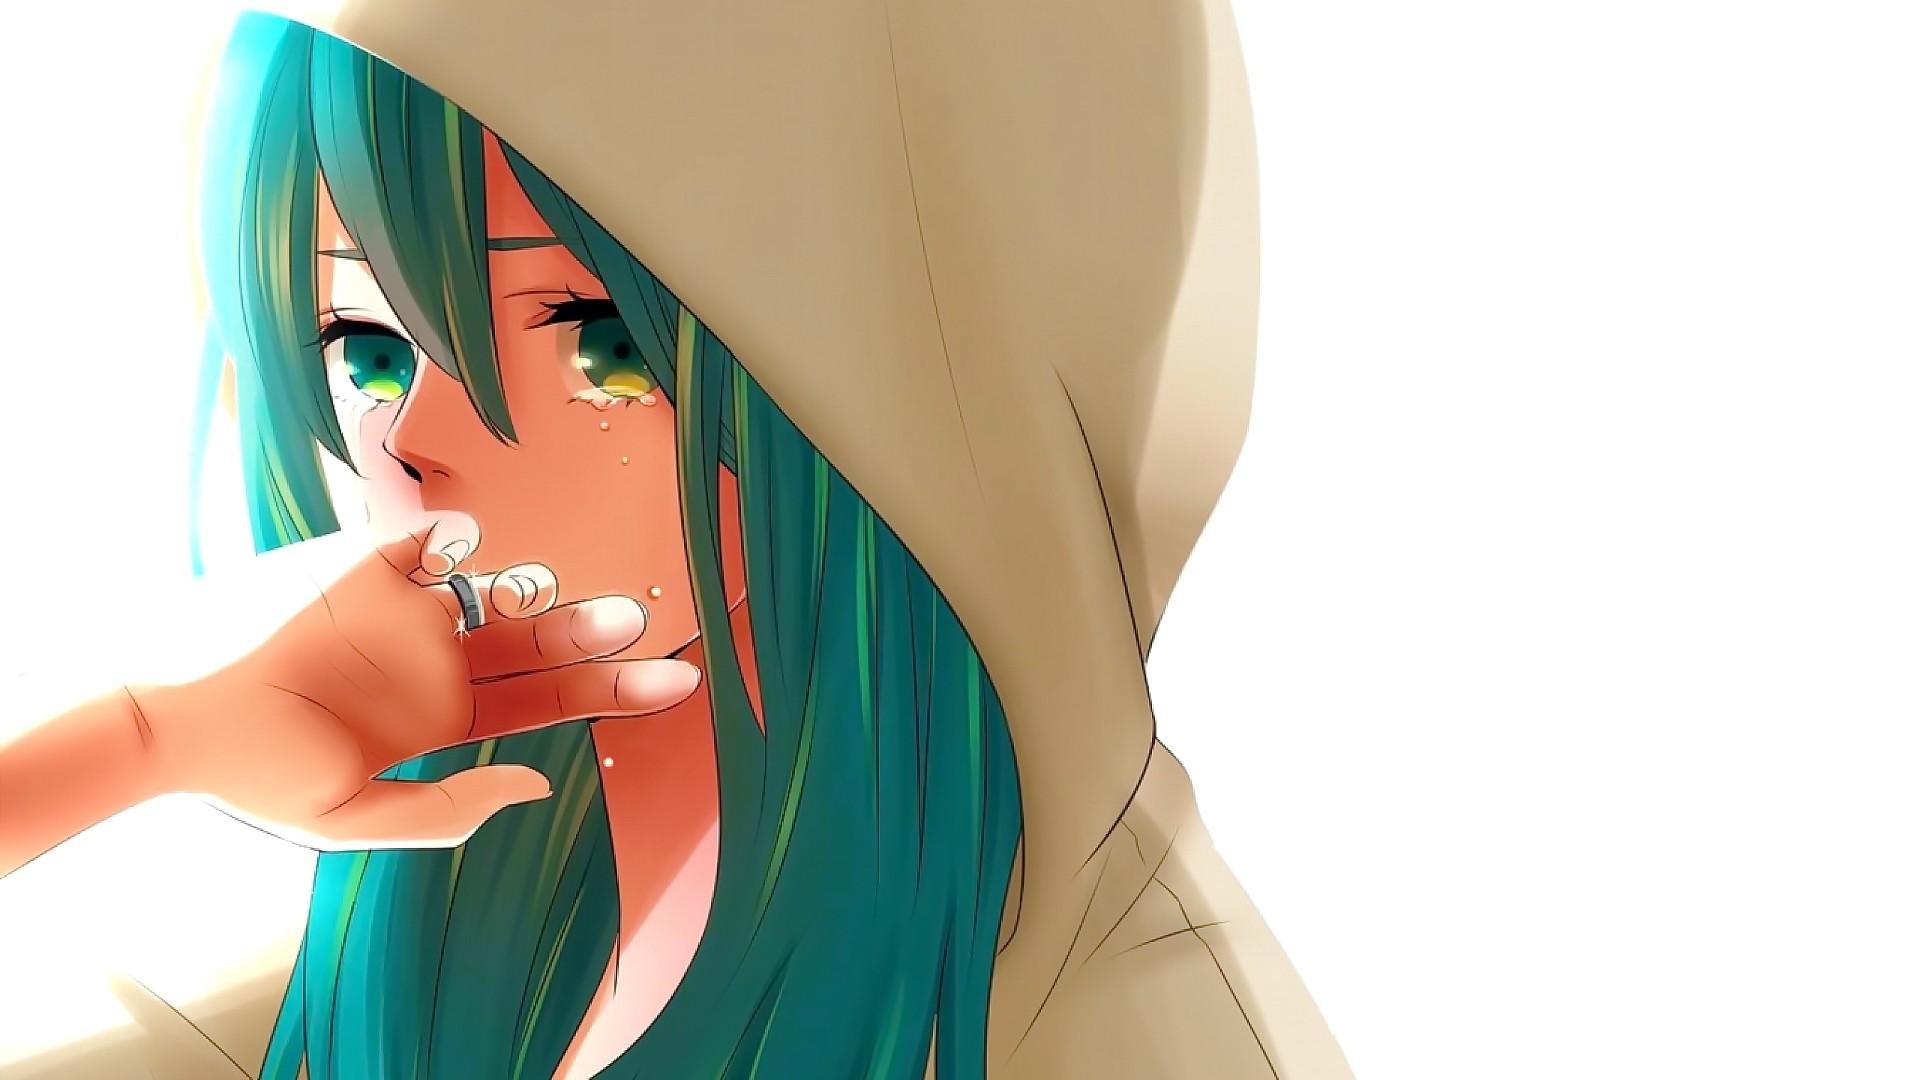 Fondos De Pantalla Cara Ilustracion Pelo Largo Anime Chicas